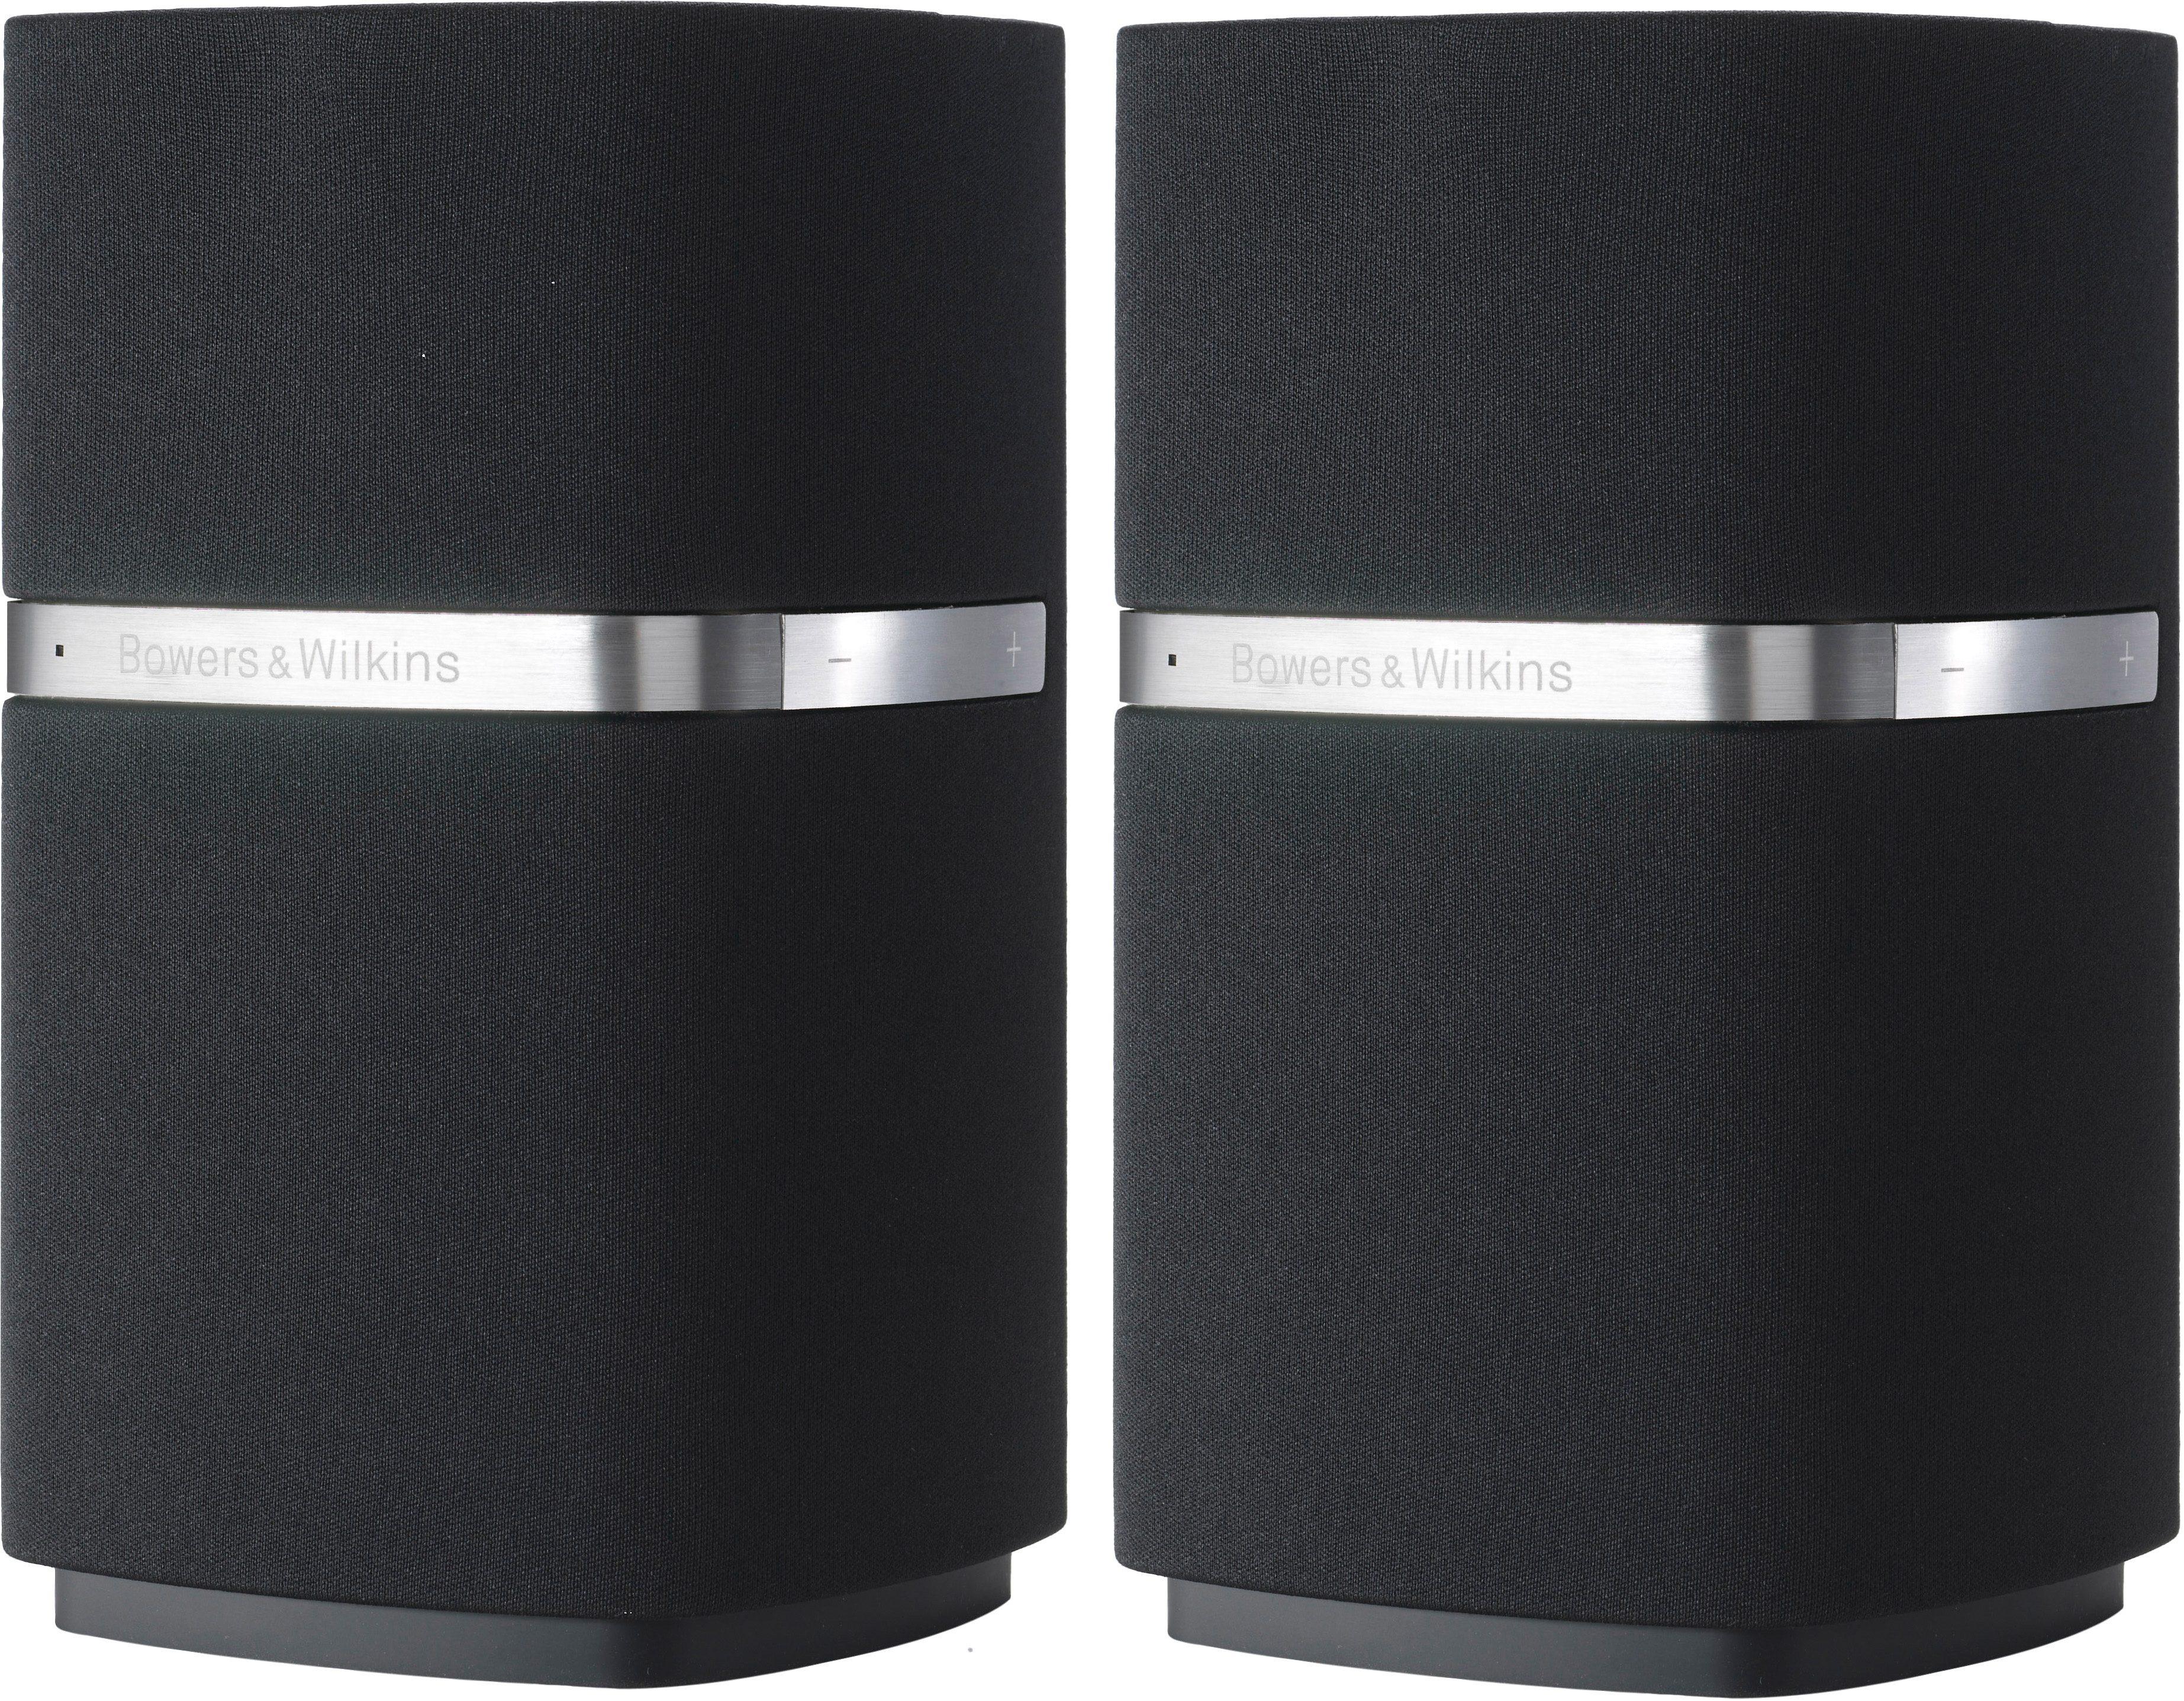 Bowers & Wilkins MM-1 HiFi-PC-Lautsprecher-Set, 4 x 18 Watt